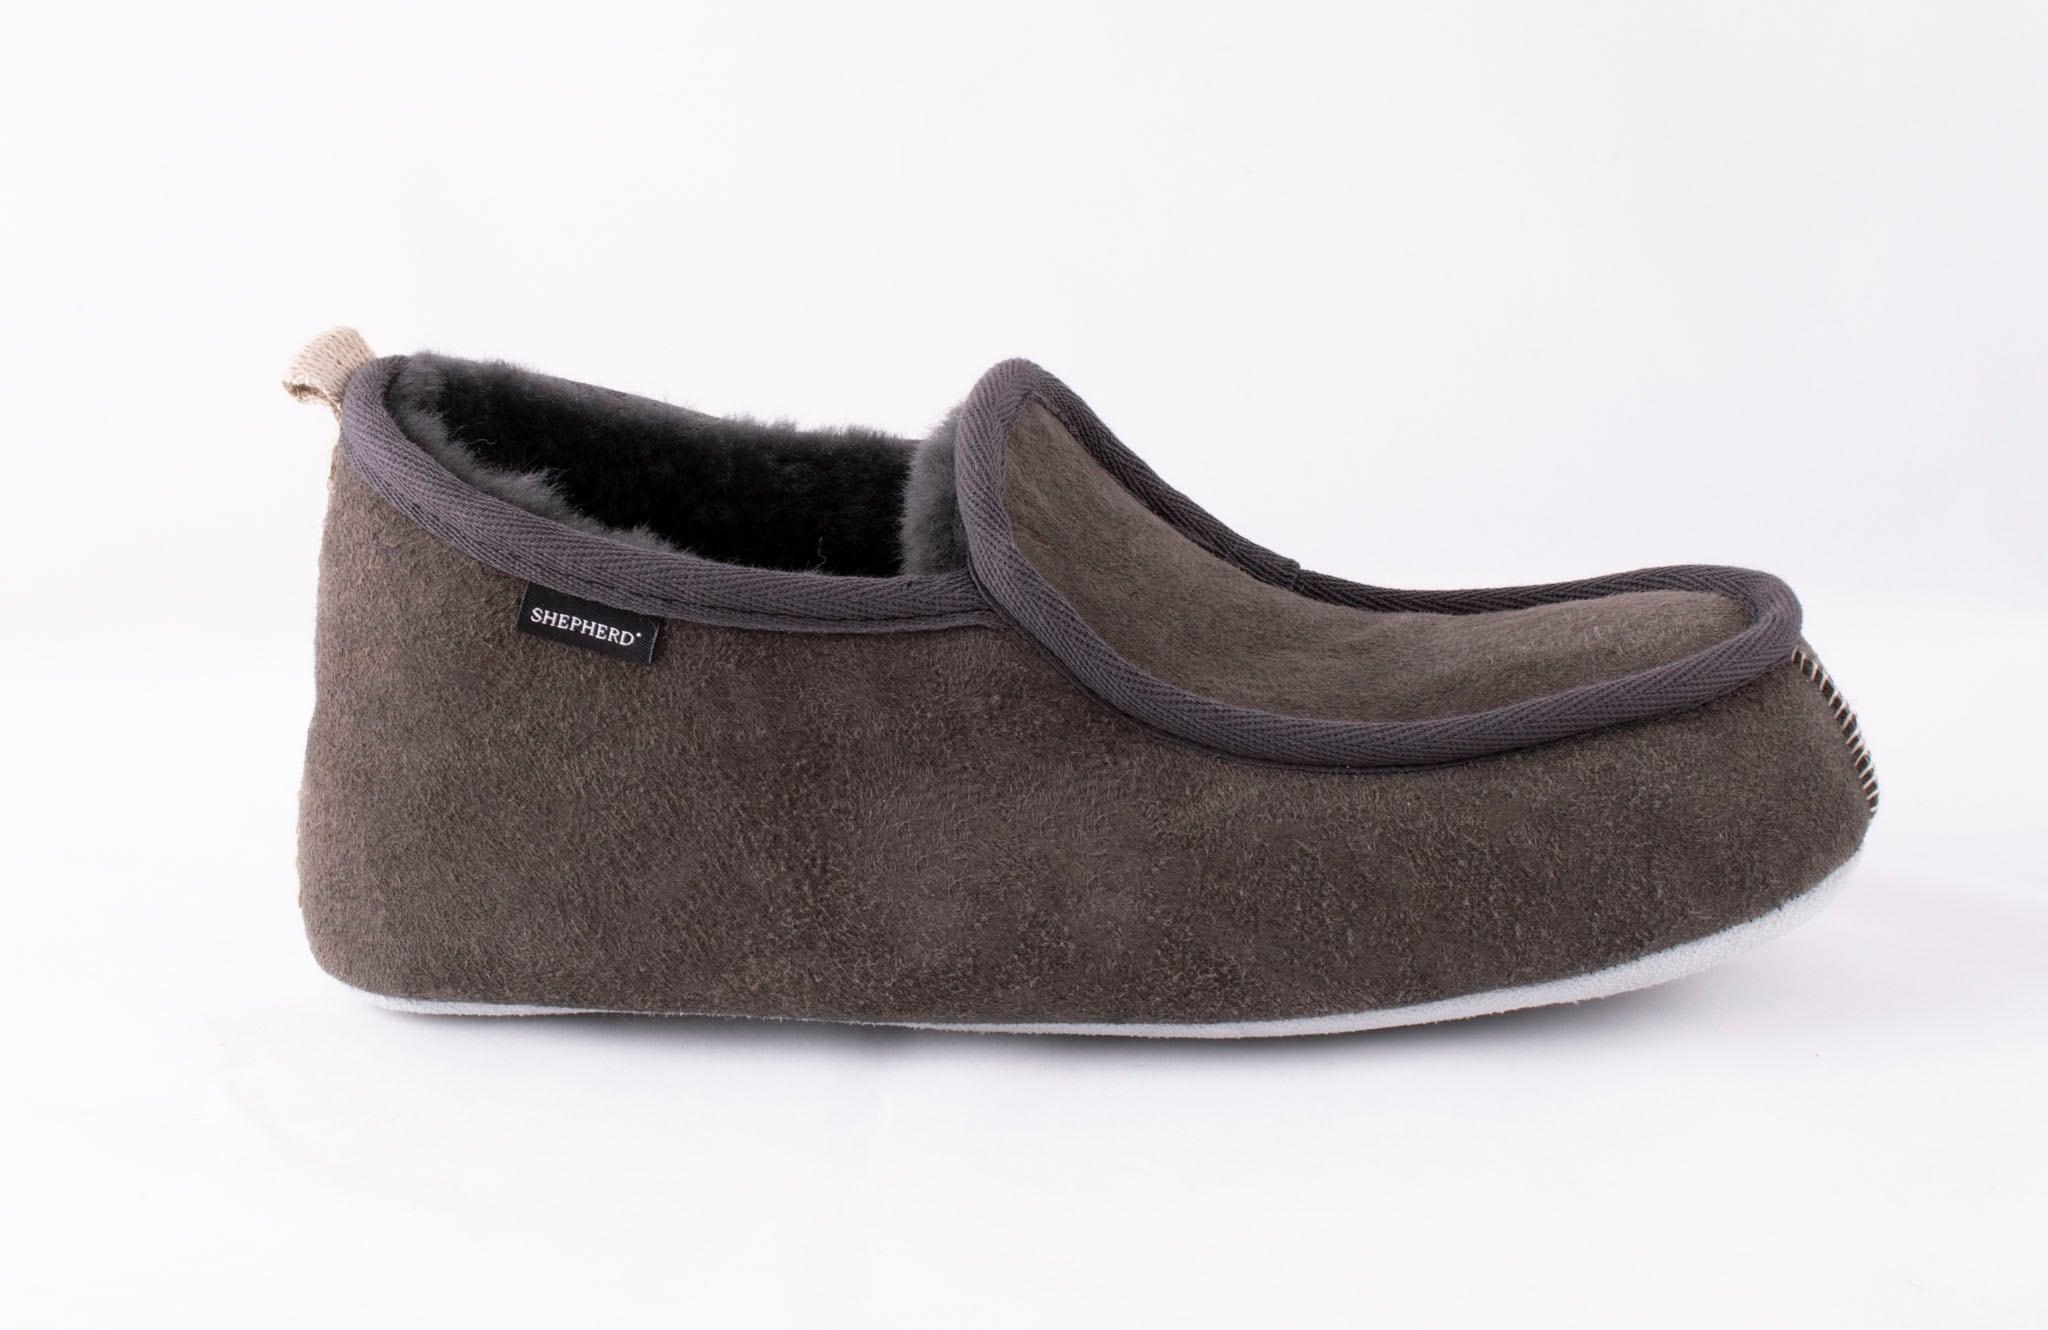 Shepherd Malte slippers